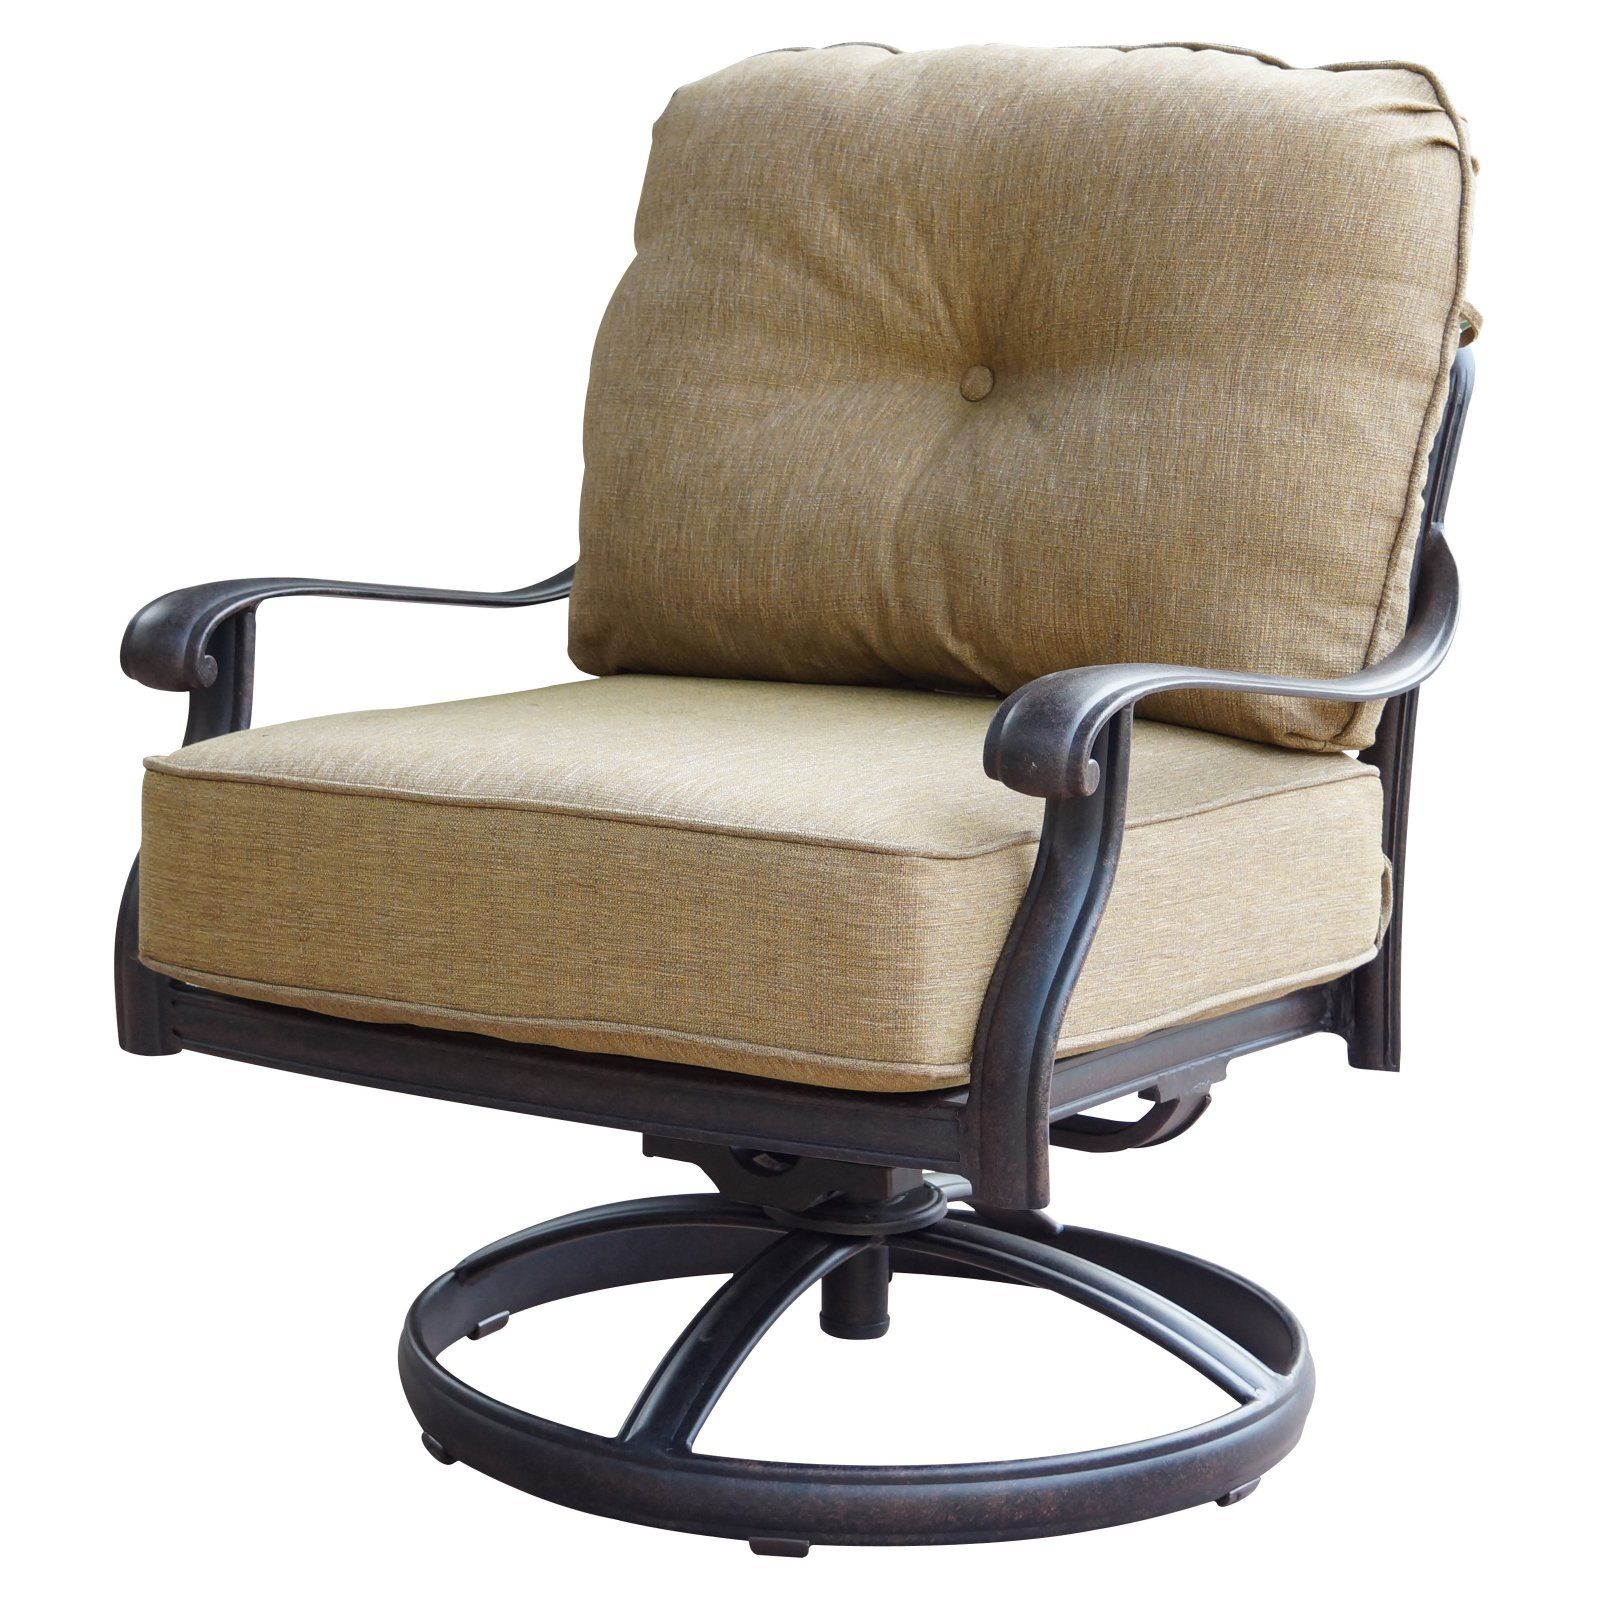 Outdoor Darlee Elisabeth Swivel Rocker Patio Club Chair Set Of 2